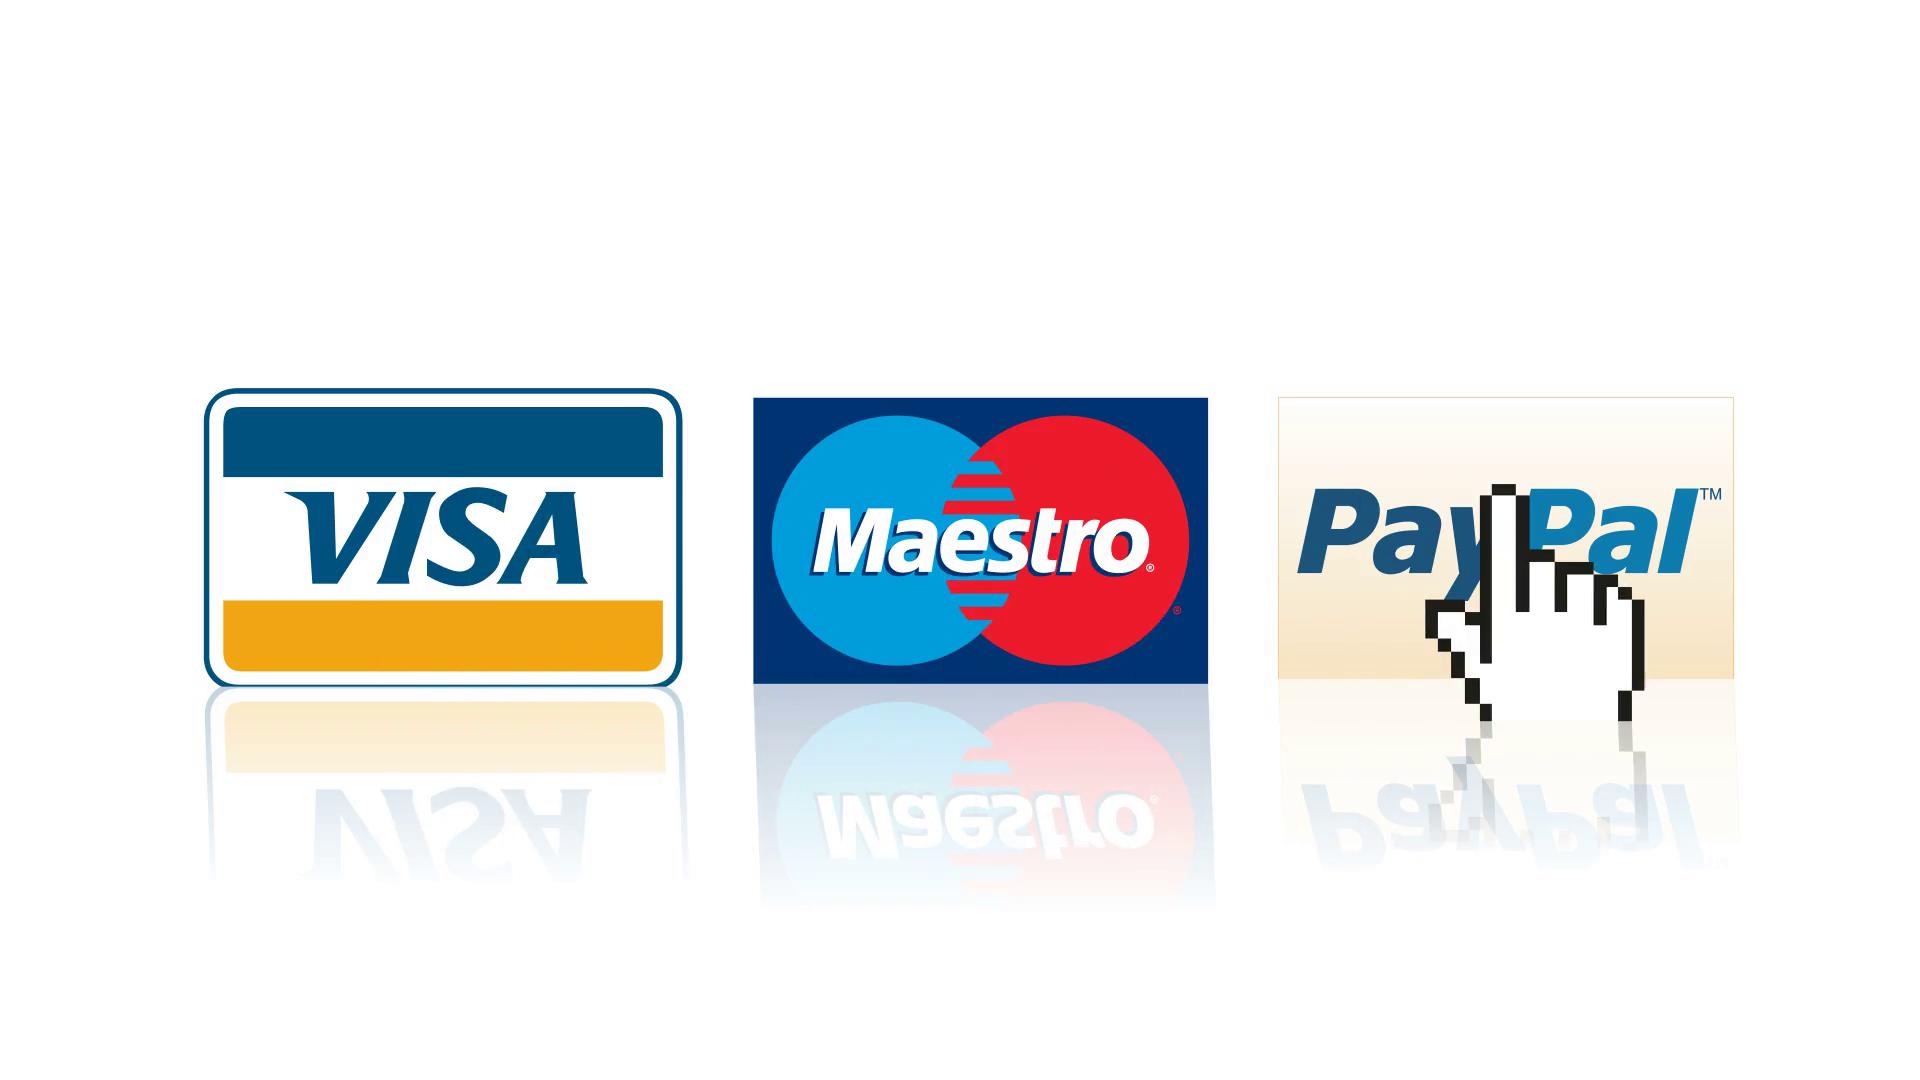 Visa, Mastercard, Paypal logos online shopping payment e.